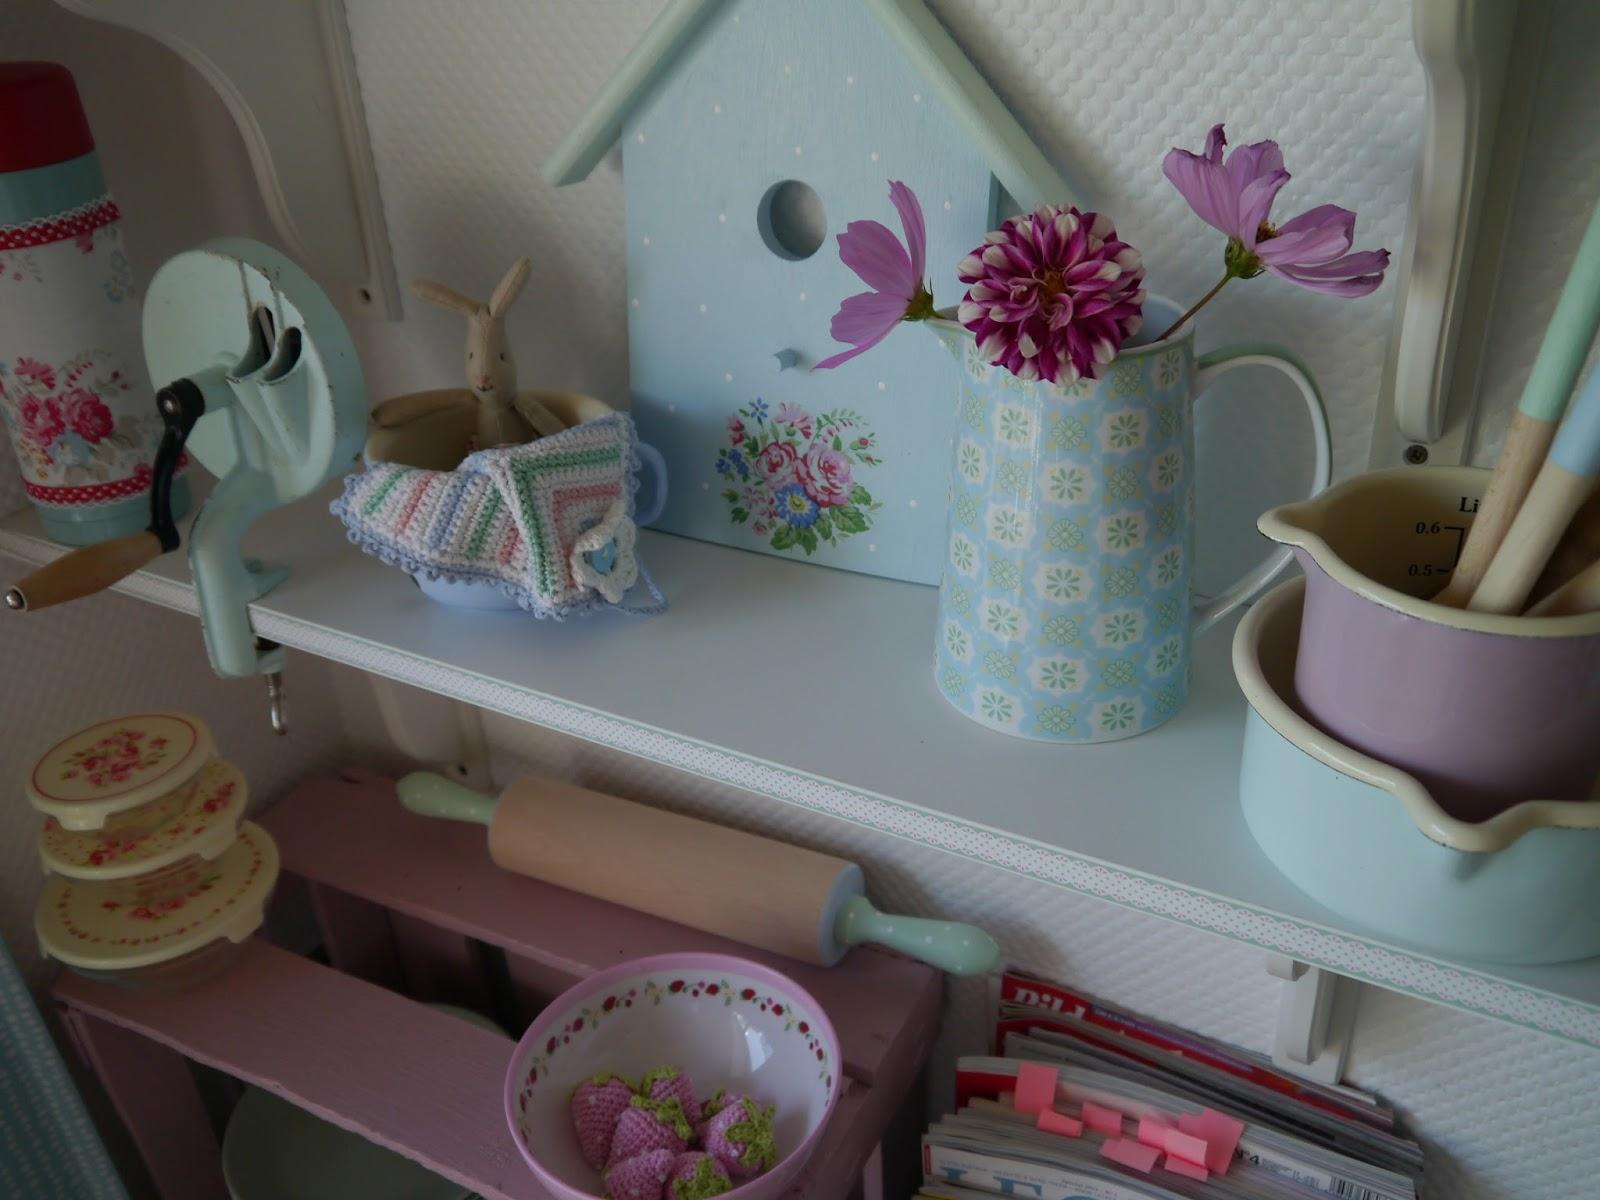 Lila lavendel kleiner deko rappel for Kleiner liegestuhl deko